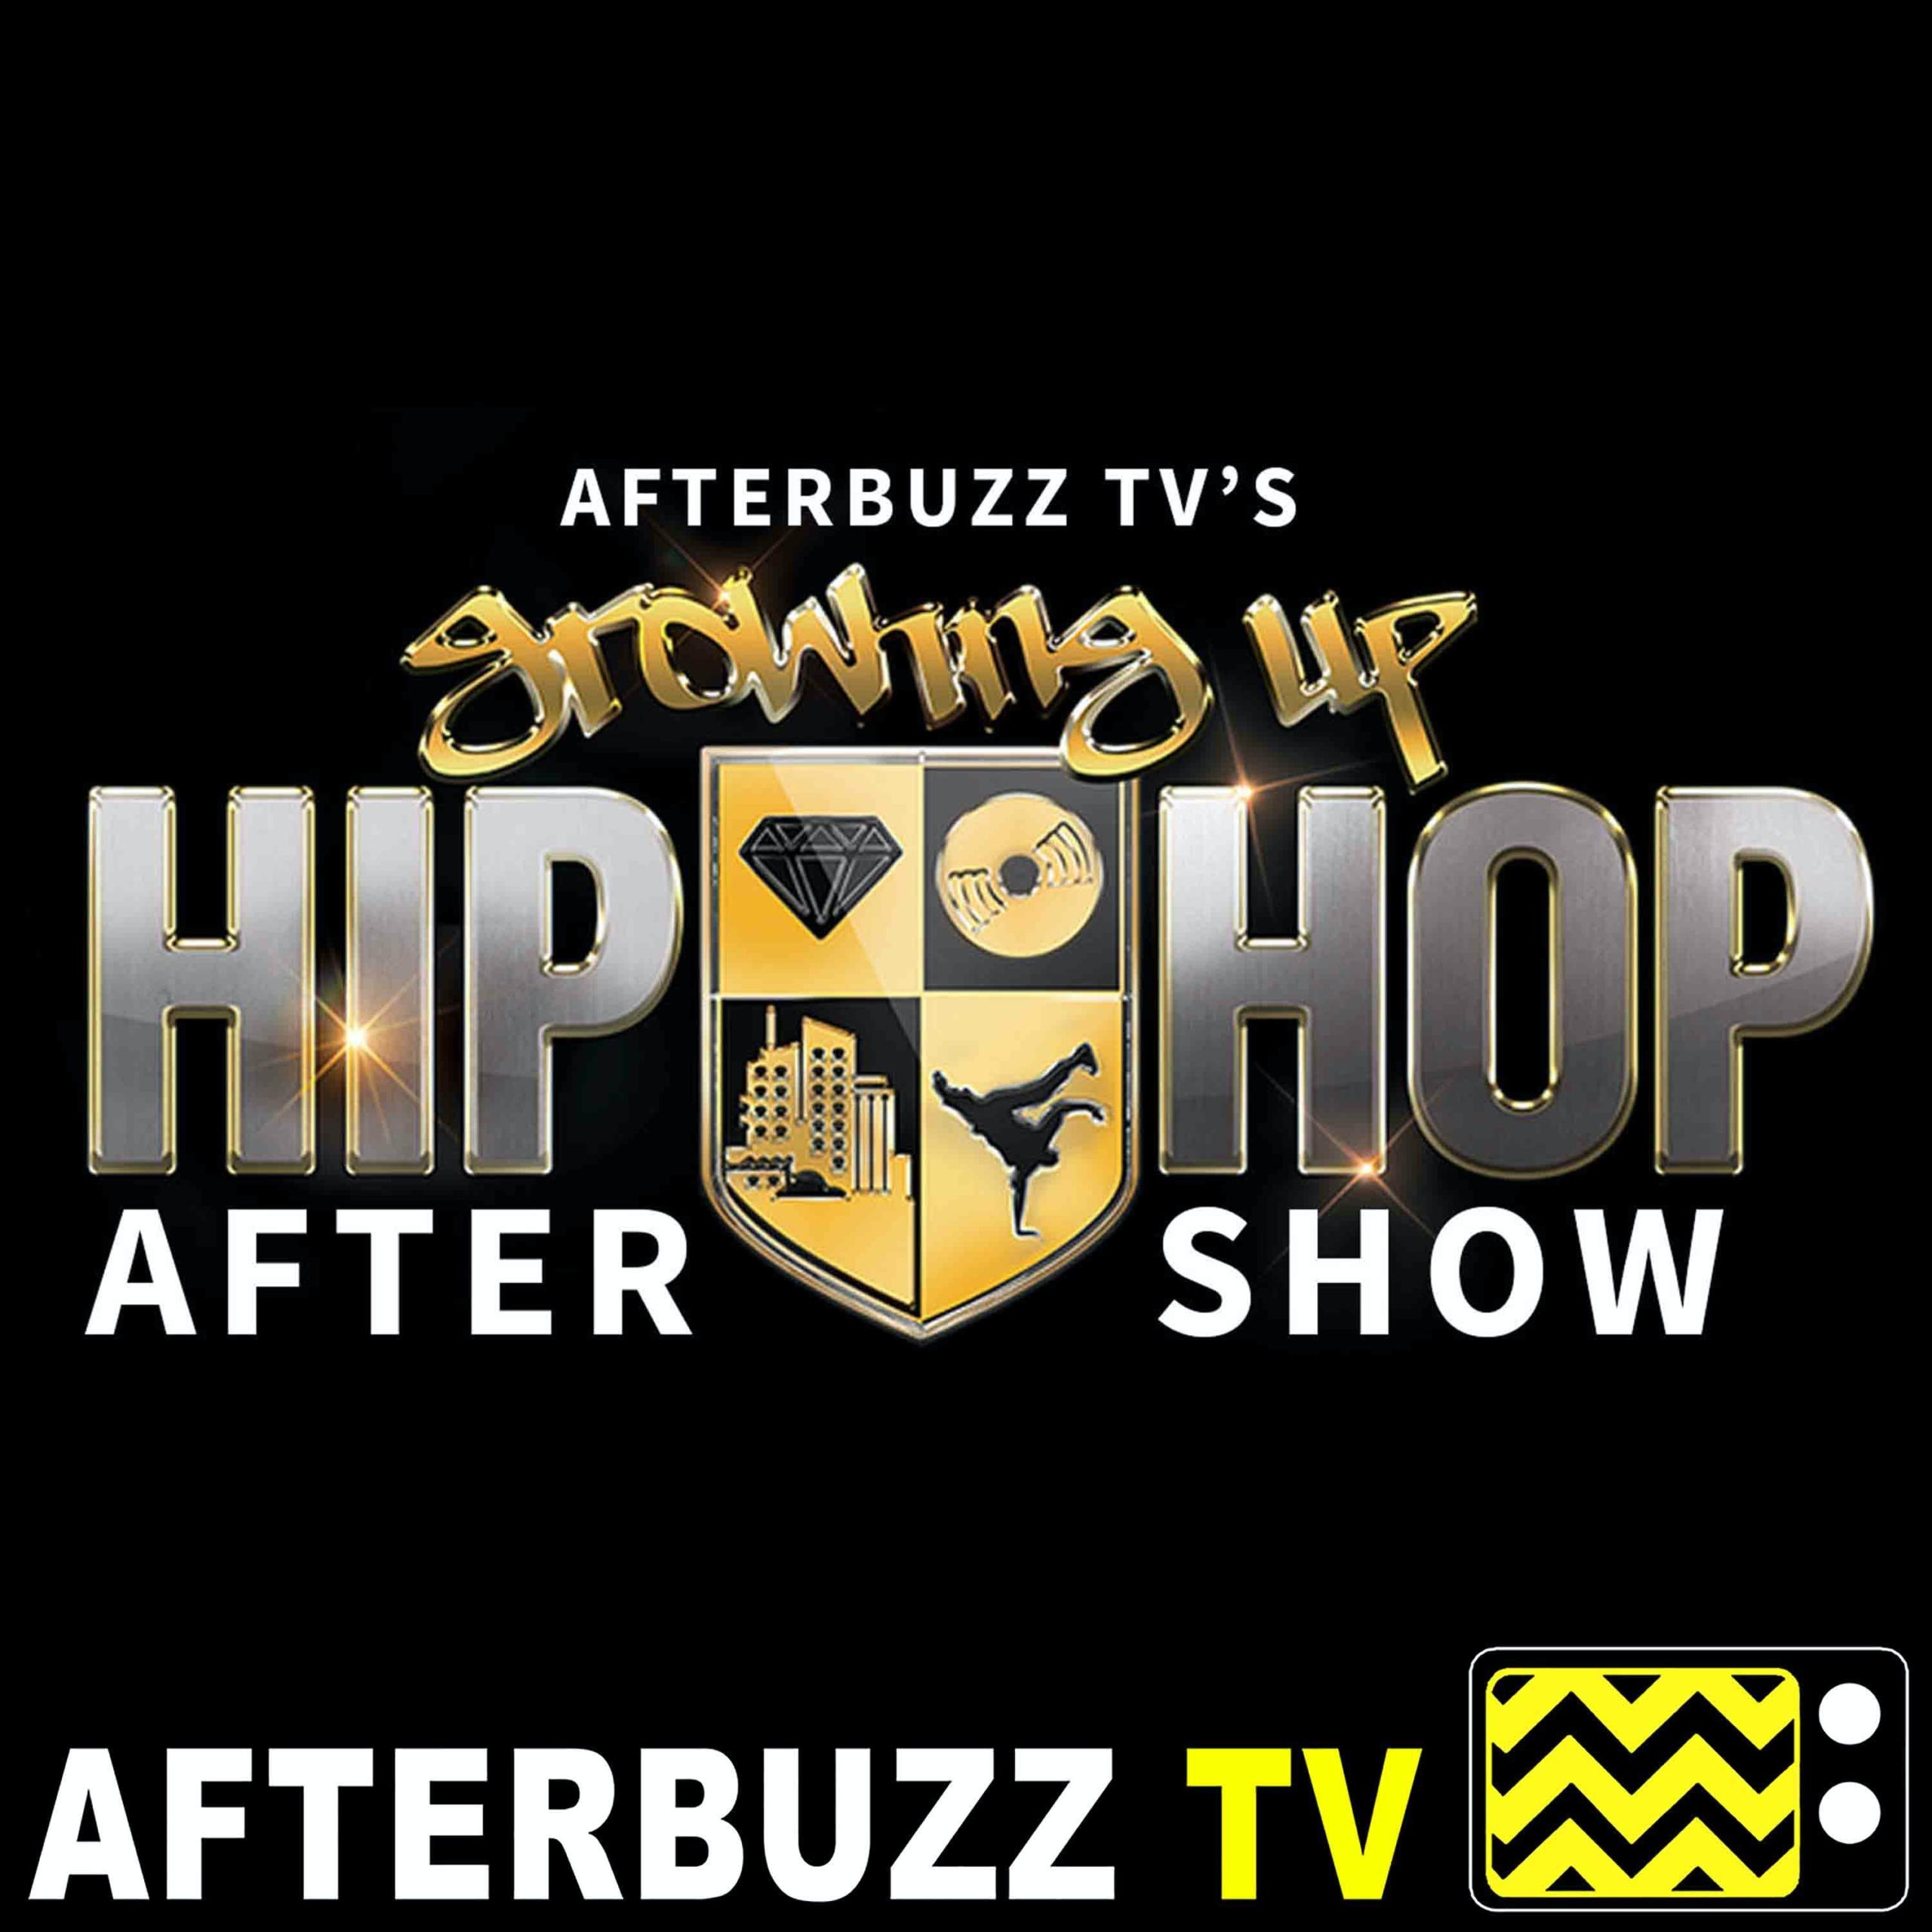 Growing Up Hip Hop S5 E22 Recap & After Show: Jojo twisted